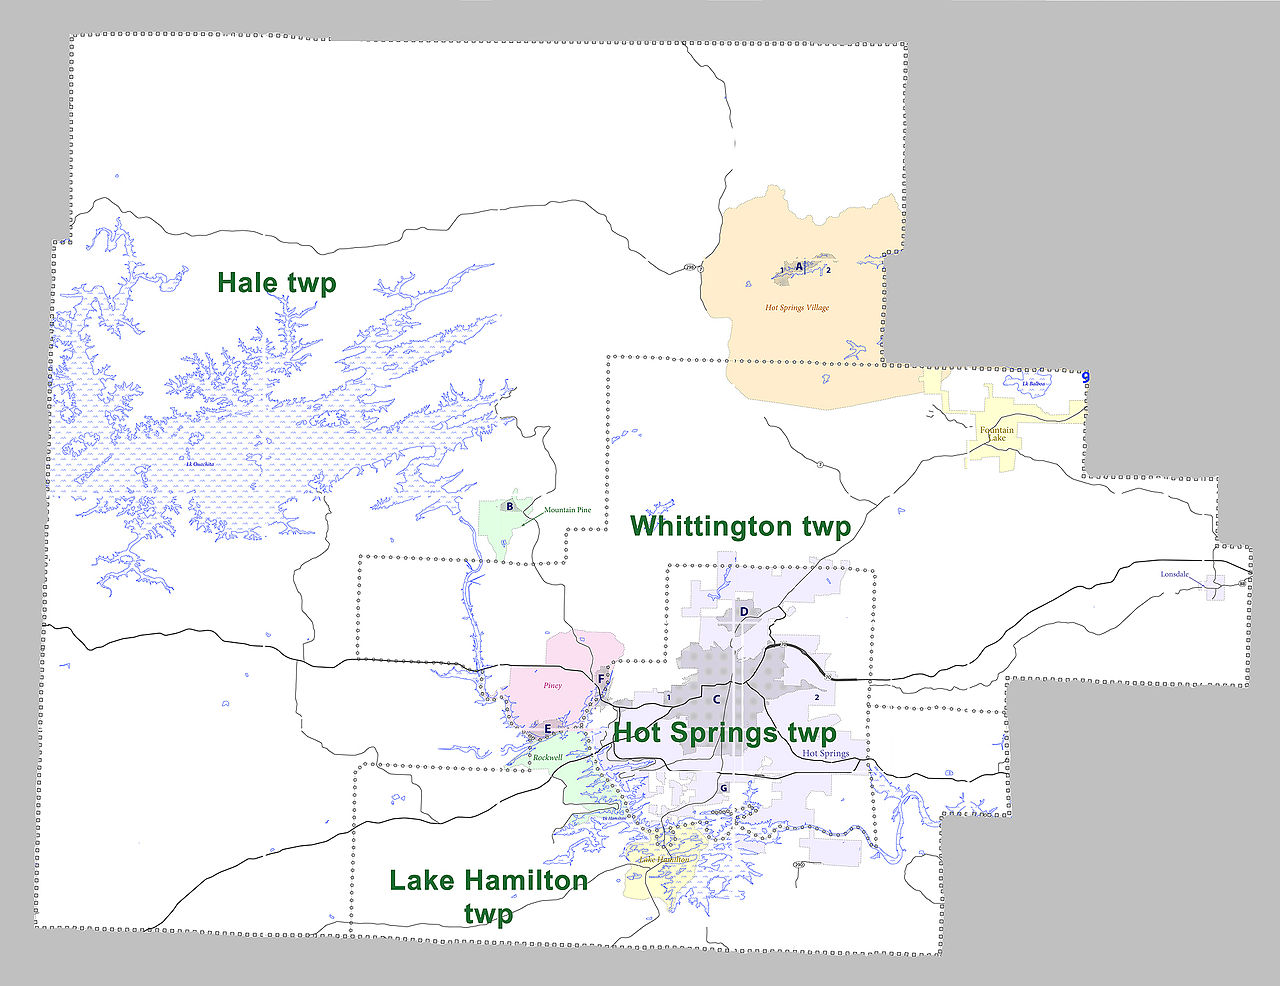 File:Garland County Arkansas 2010 Township Map large.jpg ... on map of arkansas beebe, map of arkansas ozarks, map of arkansas boone county, map of arkansas berryville, map of arkansas little rock, map of arkansas conway, map of arkansas hope, map of arkansas lakes, map of arkansas harrison, map of arkansas searcy, map of arkansas mountain view, map of arkansas louisiana, map of arkansas paragould, map of arkansas with rivers, map of arkansas national forests, map of arkansas state parks, map of arkansas texas, map of arkansas murfreesboro, map of arkansas mountain pine, map of arkansas russellville,